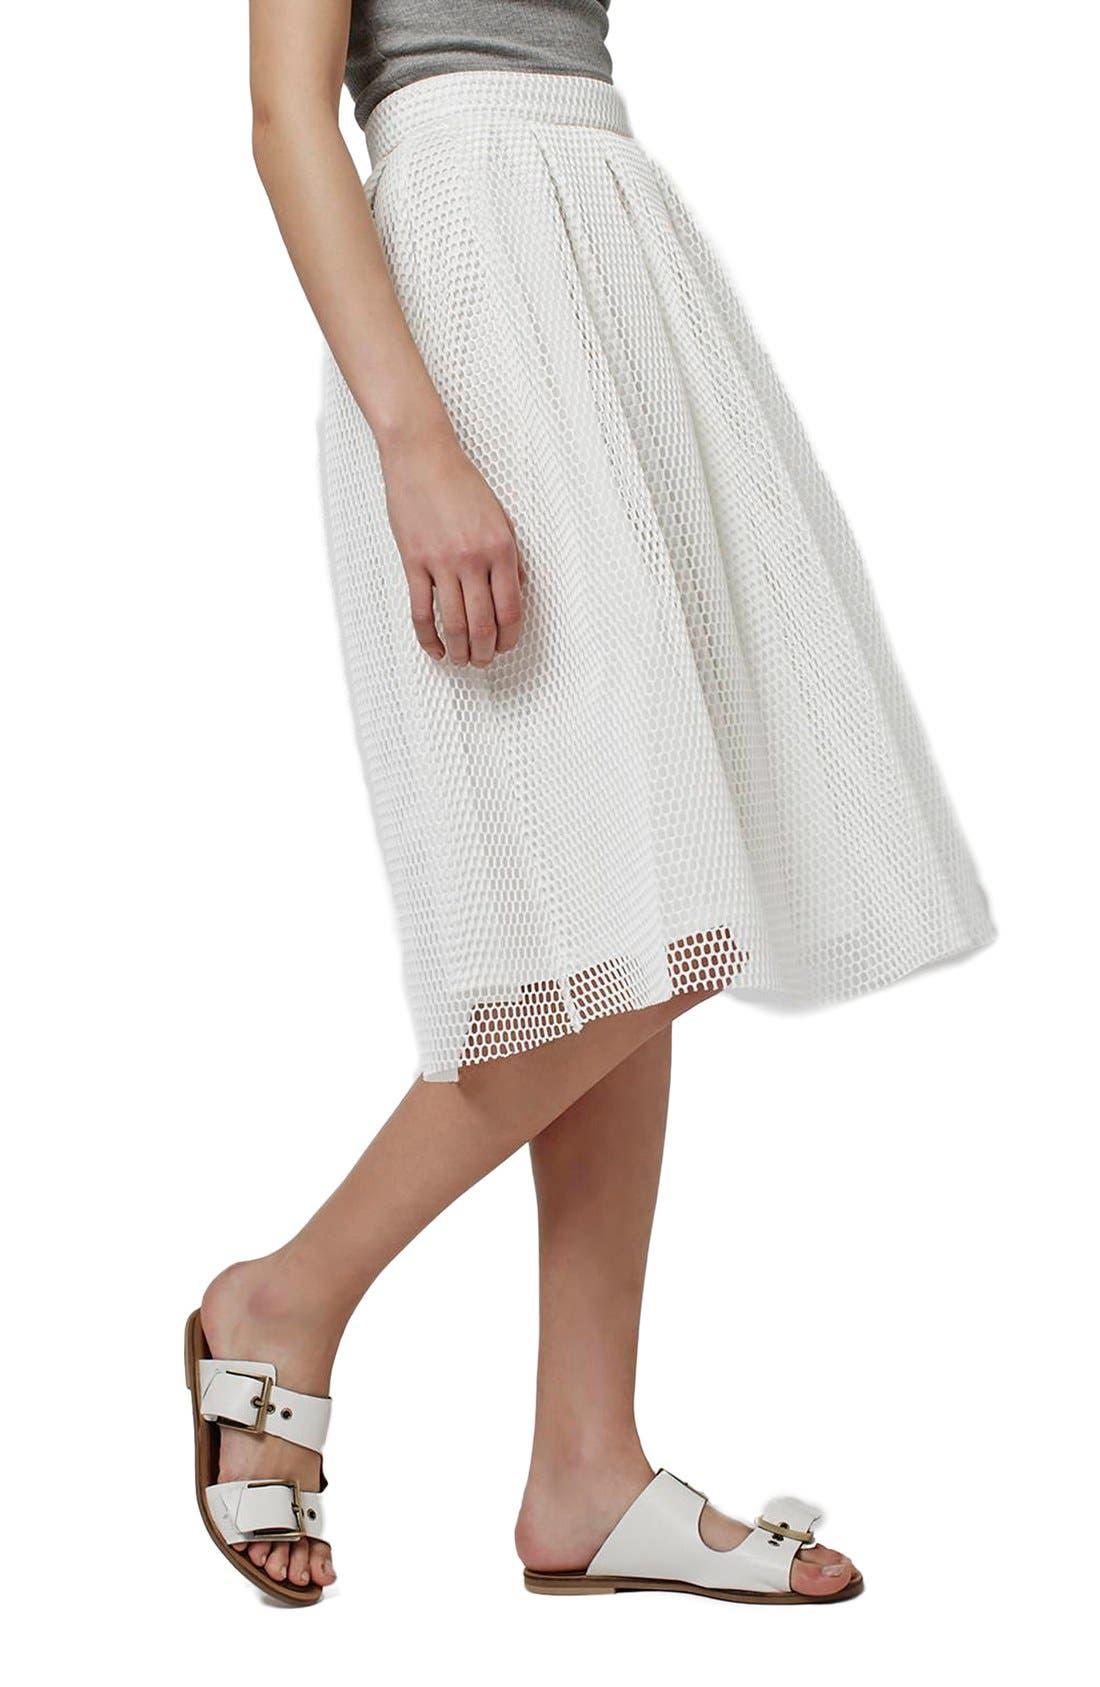 TOPSHOP, Airtex Pleat Midi Skirt, Main thumbnail 1, color, 100